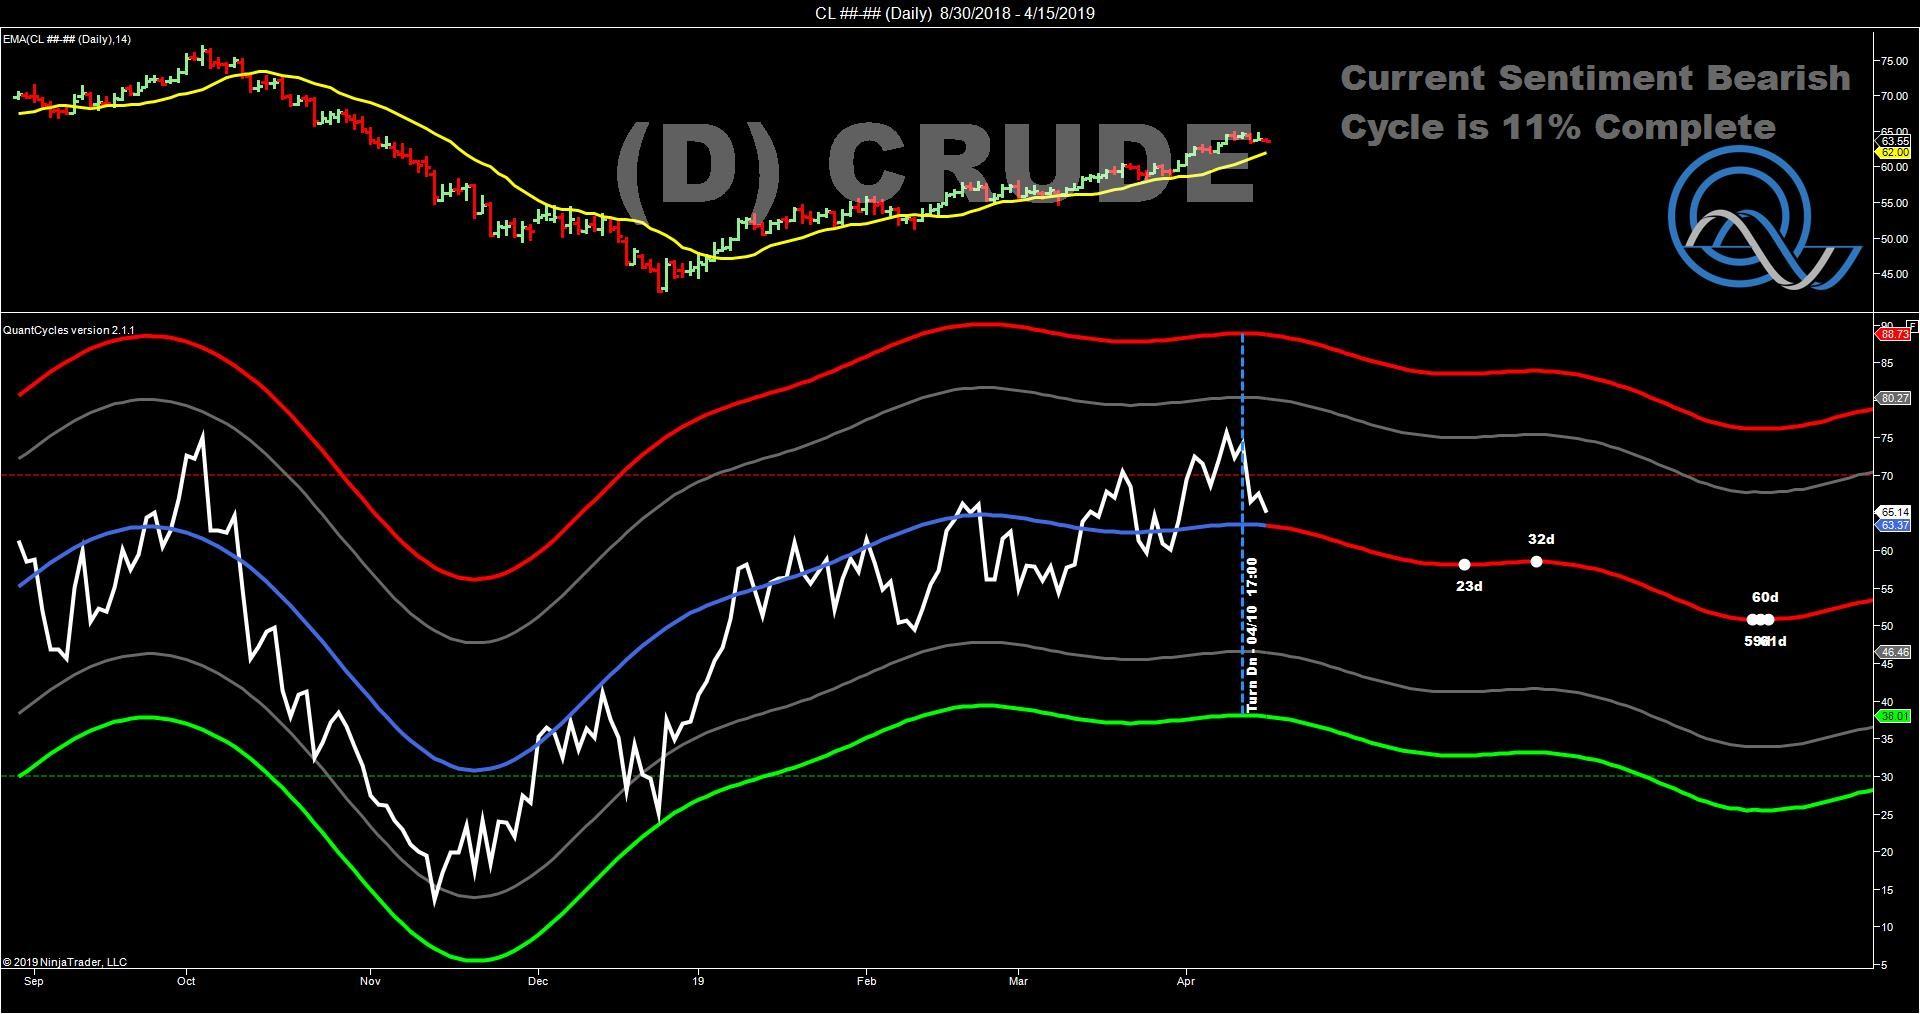 Crude D